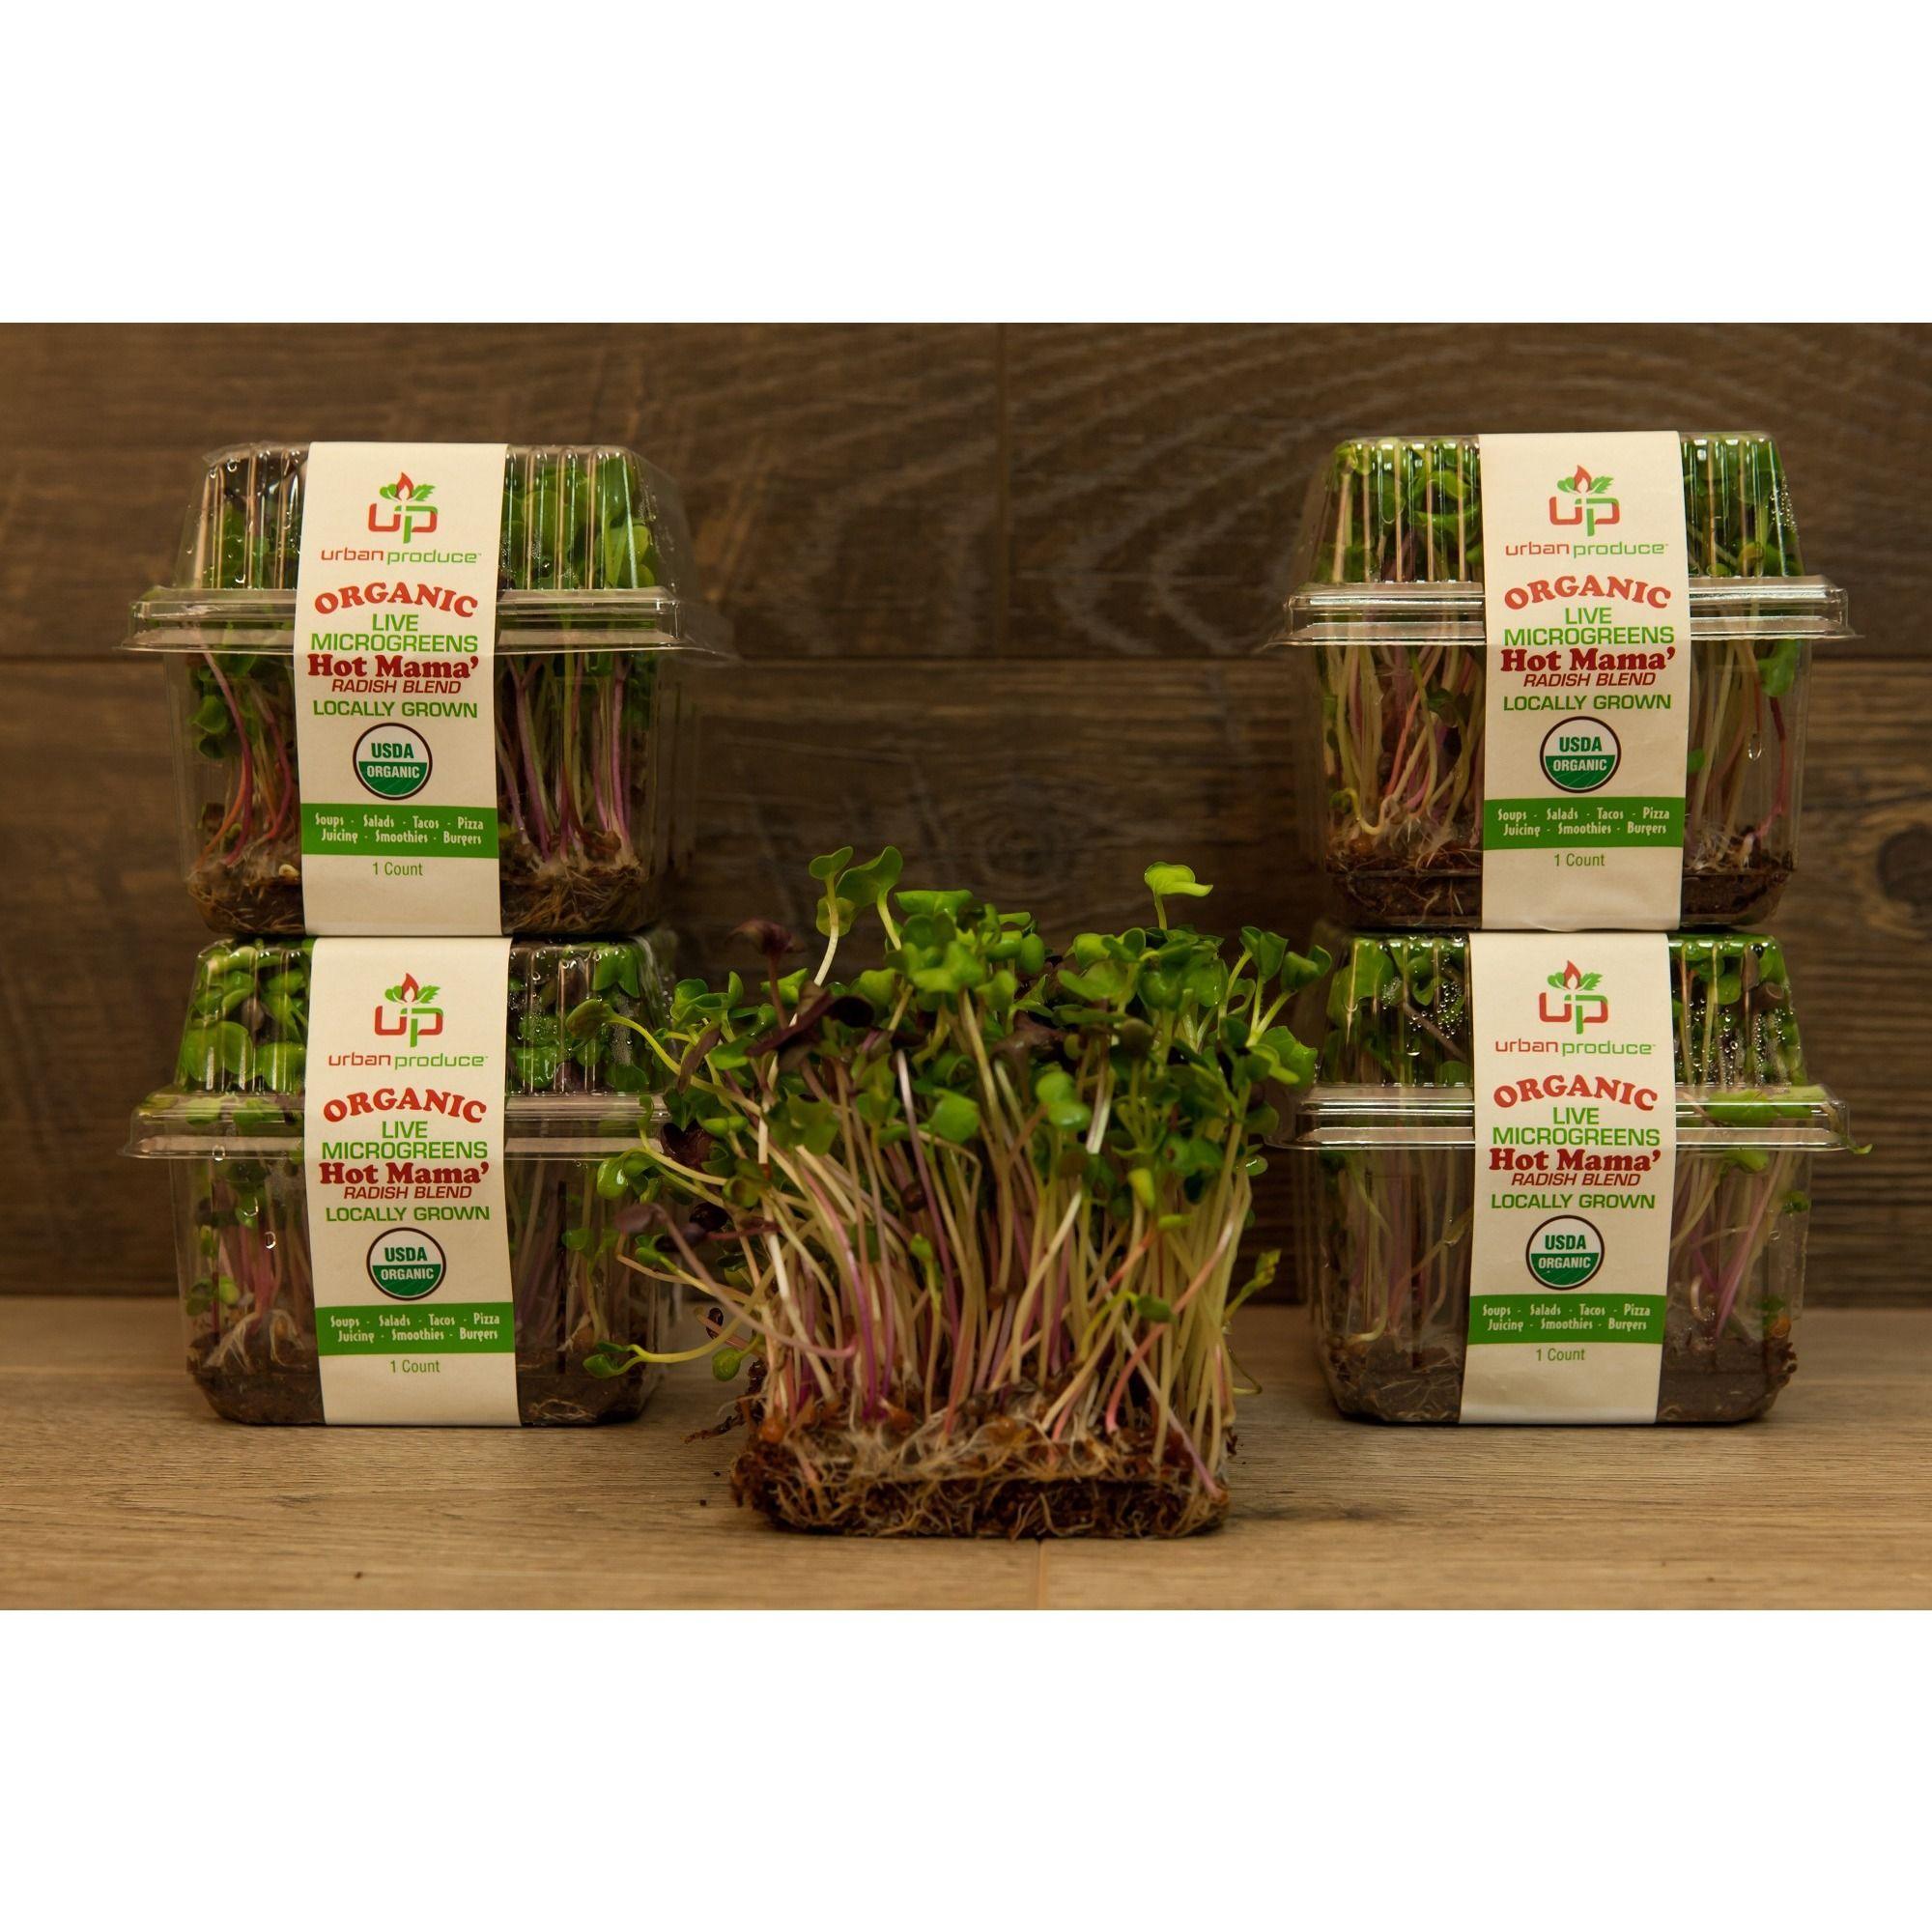 Urban Produce Certified Organic Living Hot Mama Microgreens